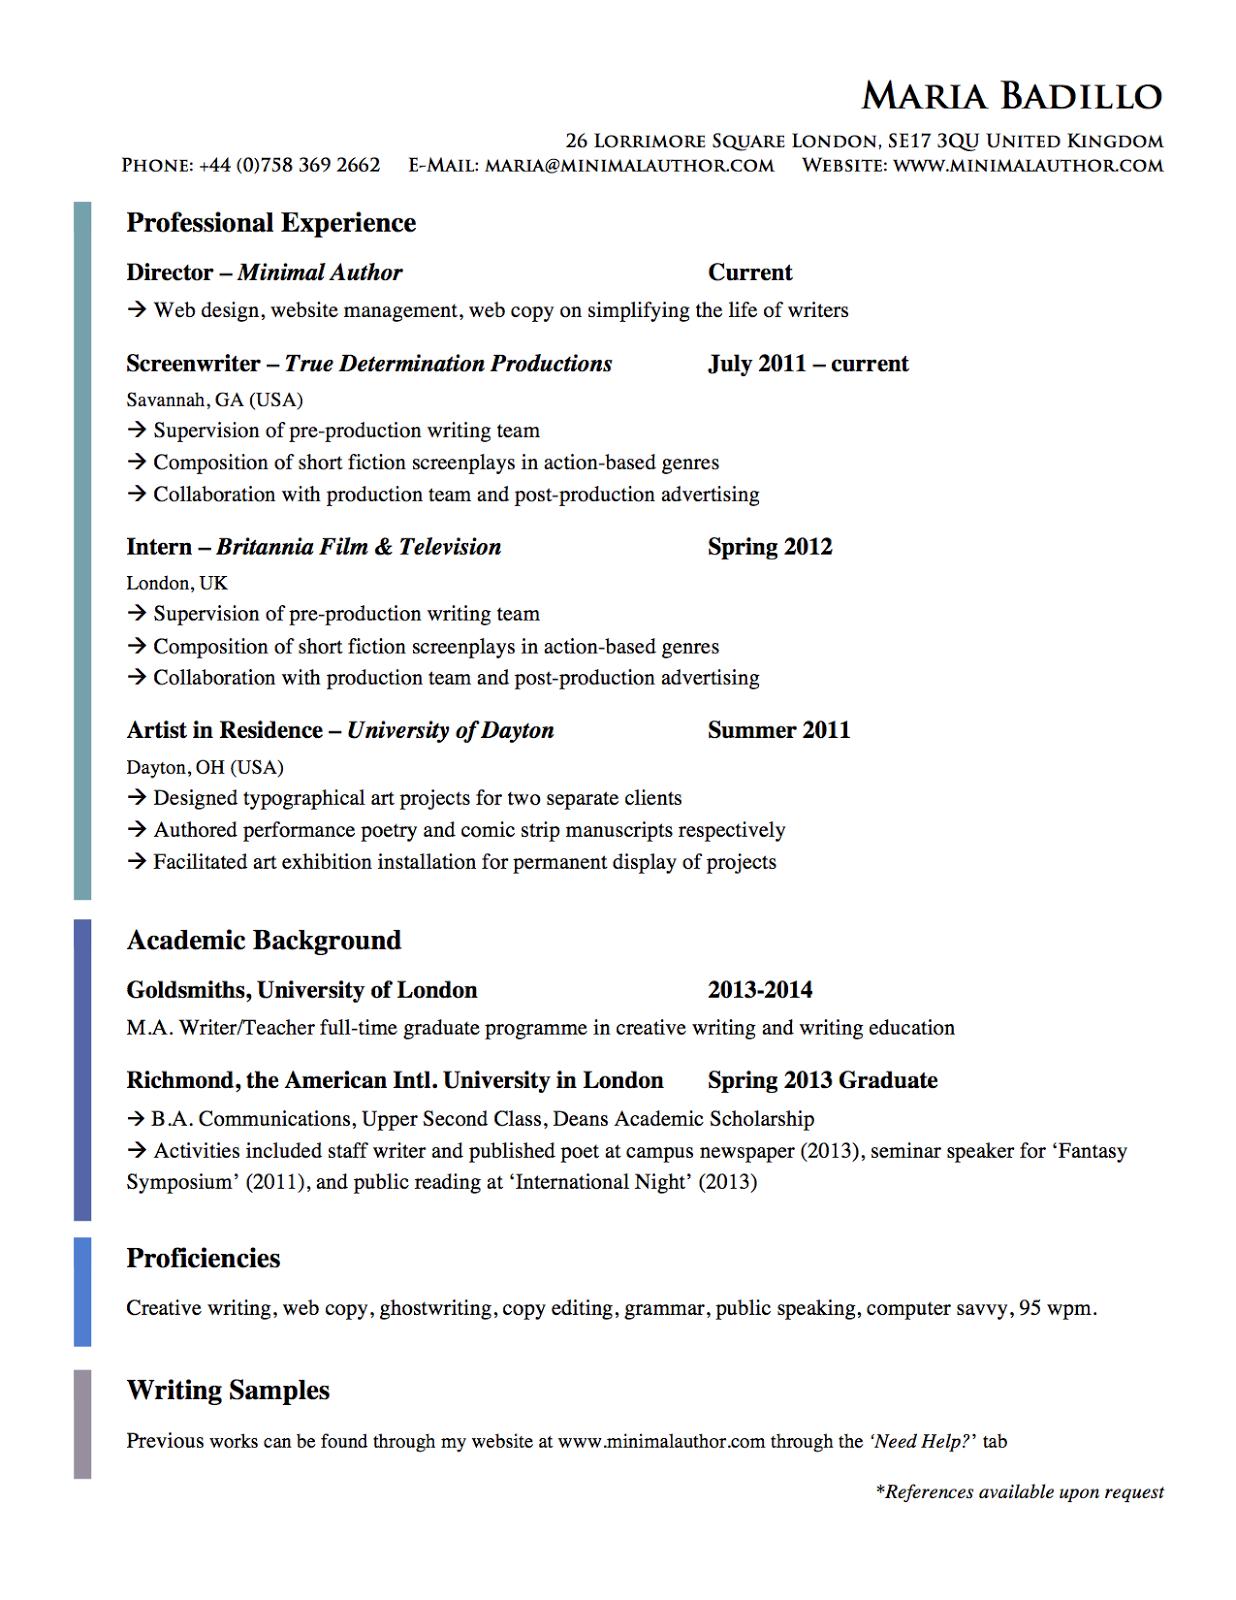 irene chans resume pg 4 american university resume help american